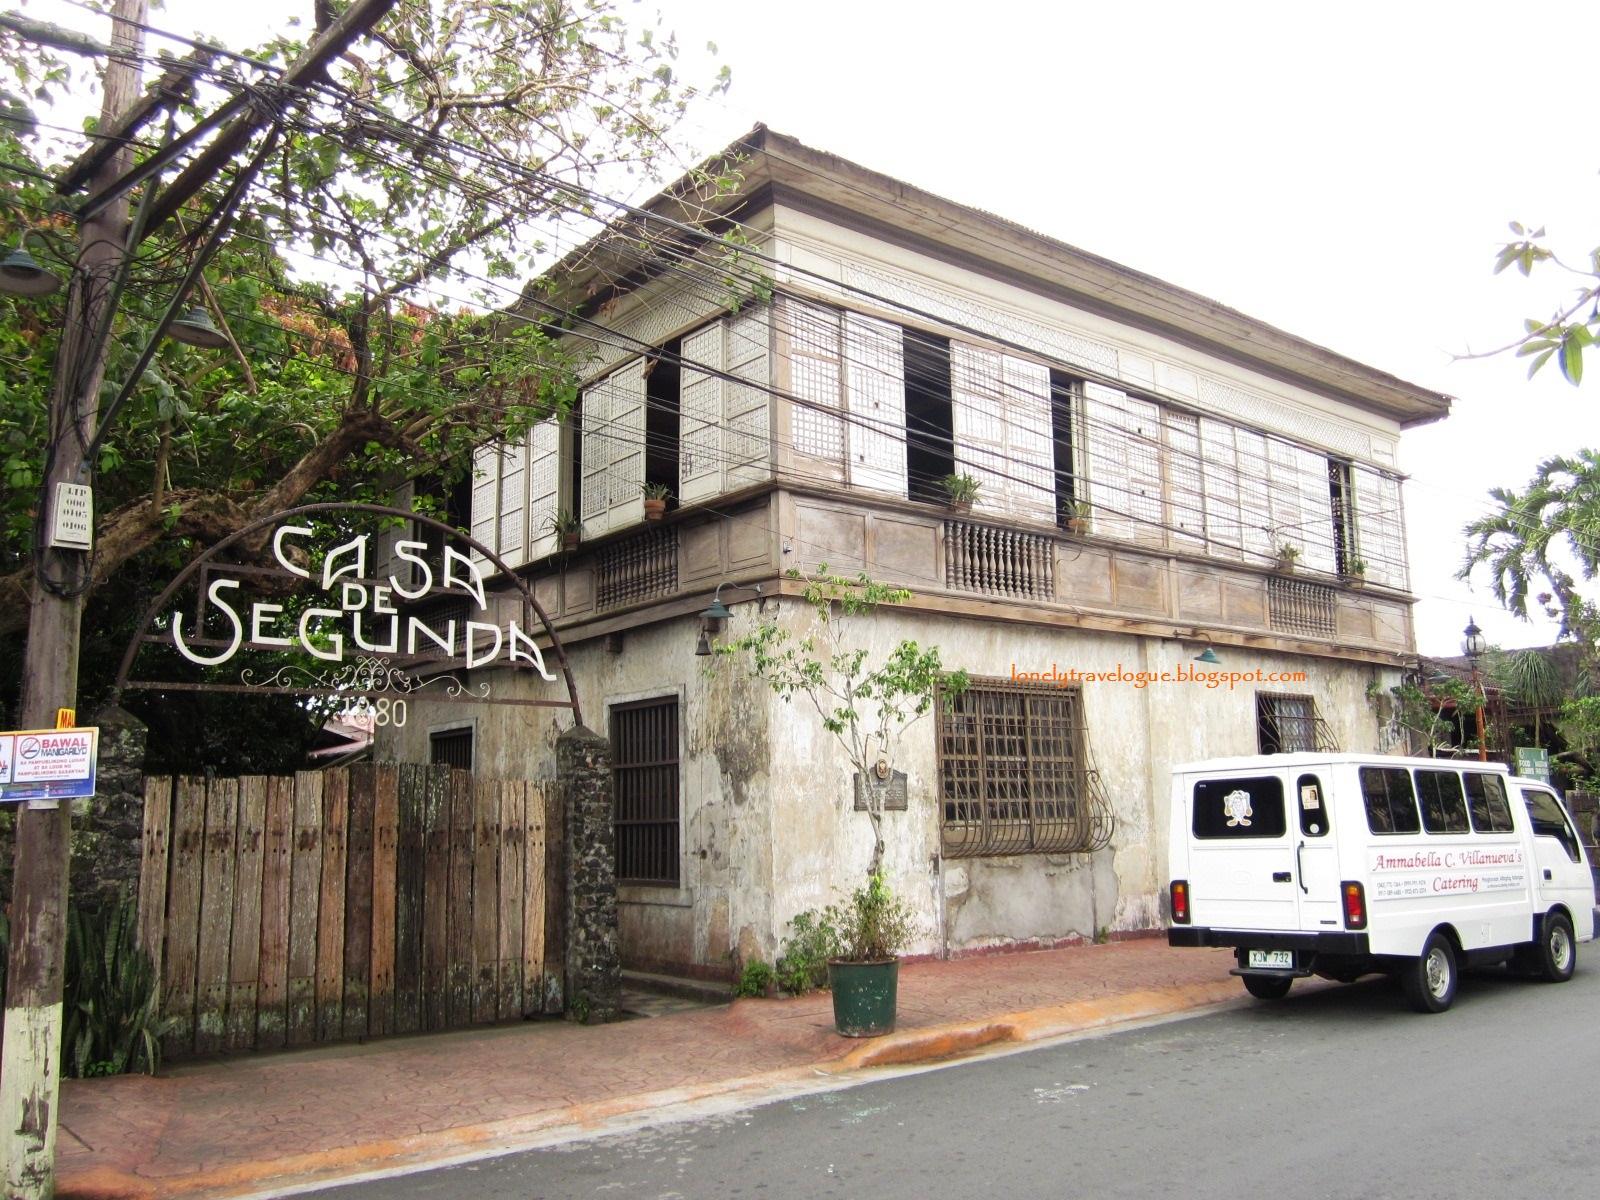 Lonely Travelogue Casa De Segunda Home Of Pepe S First Love